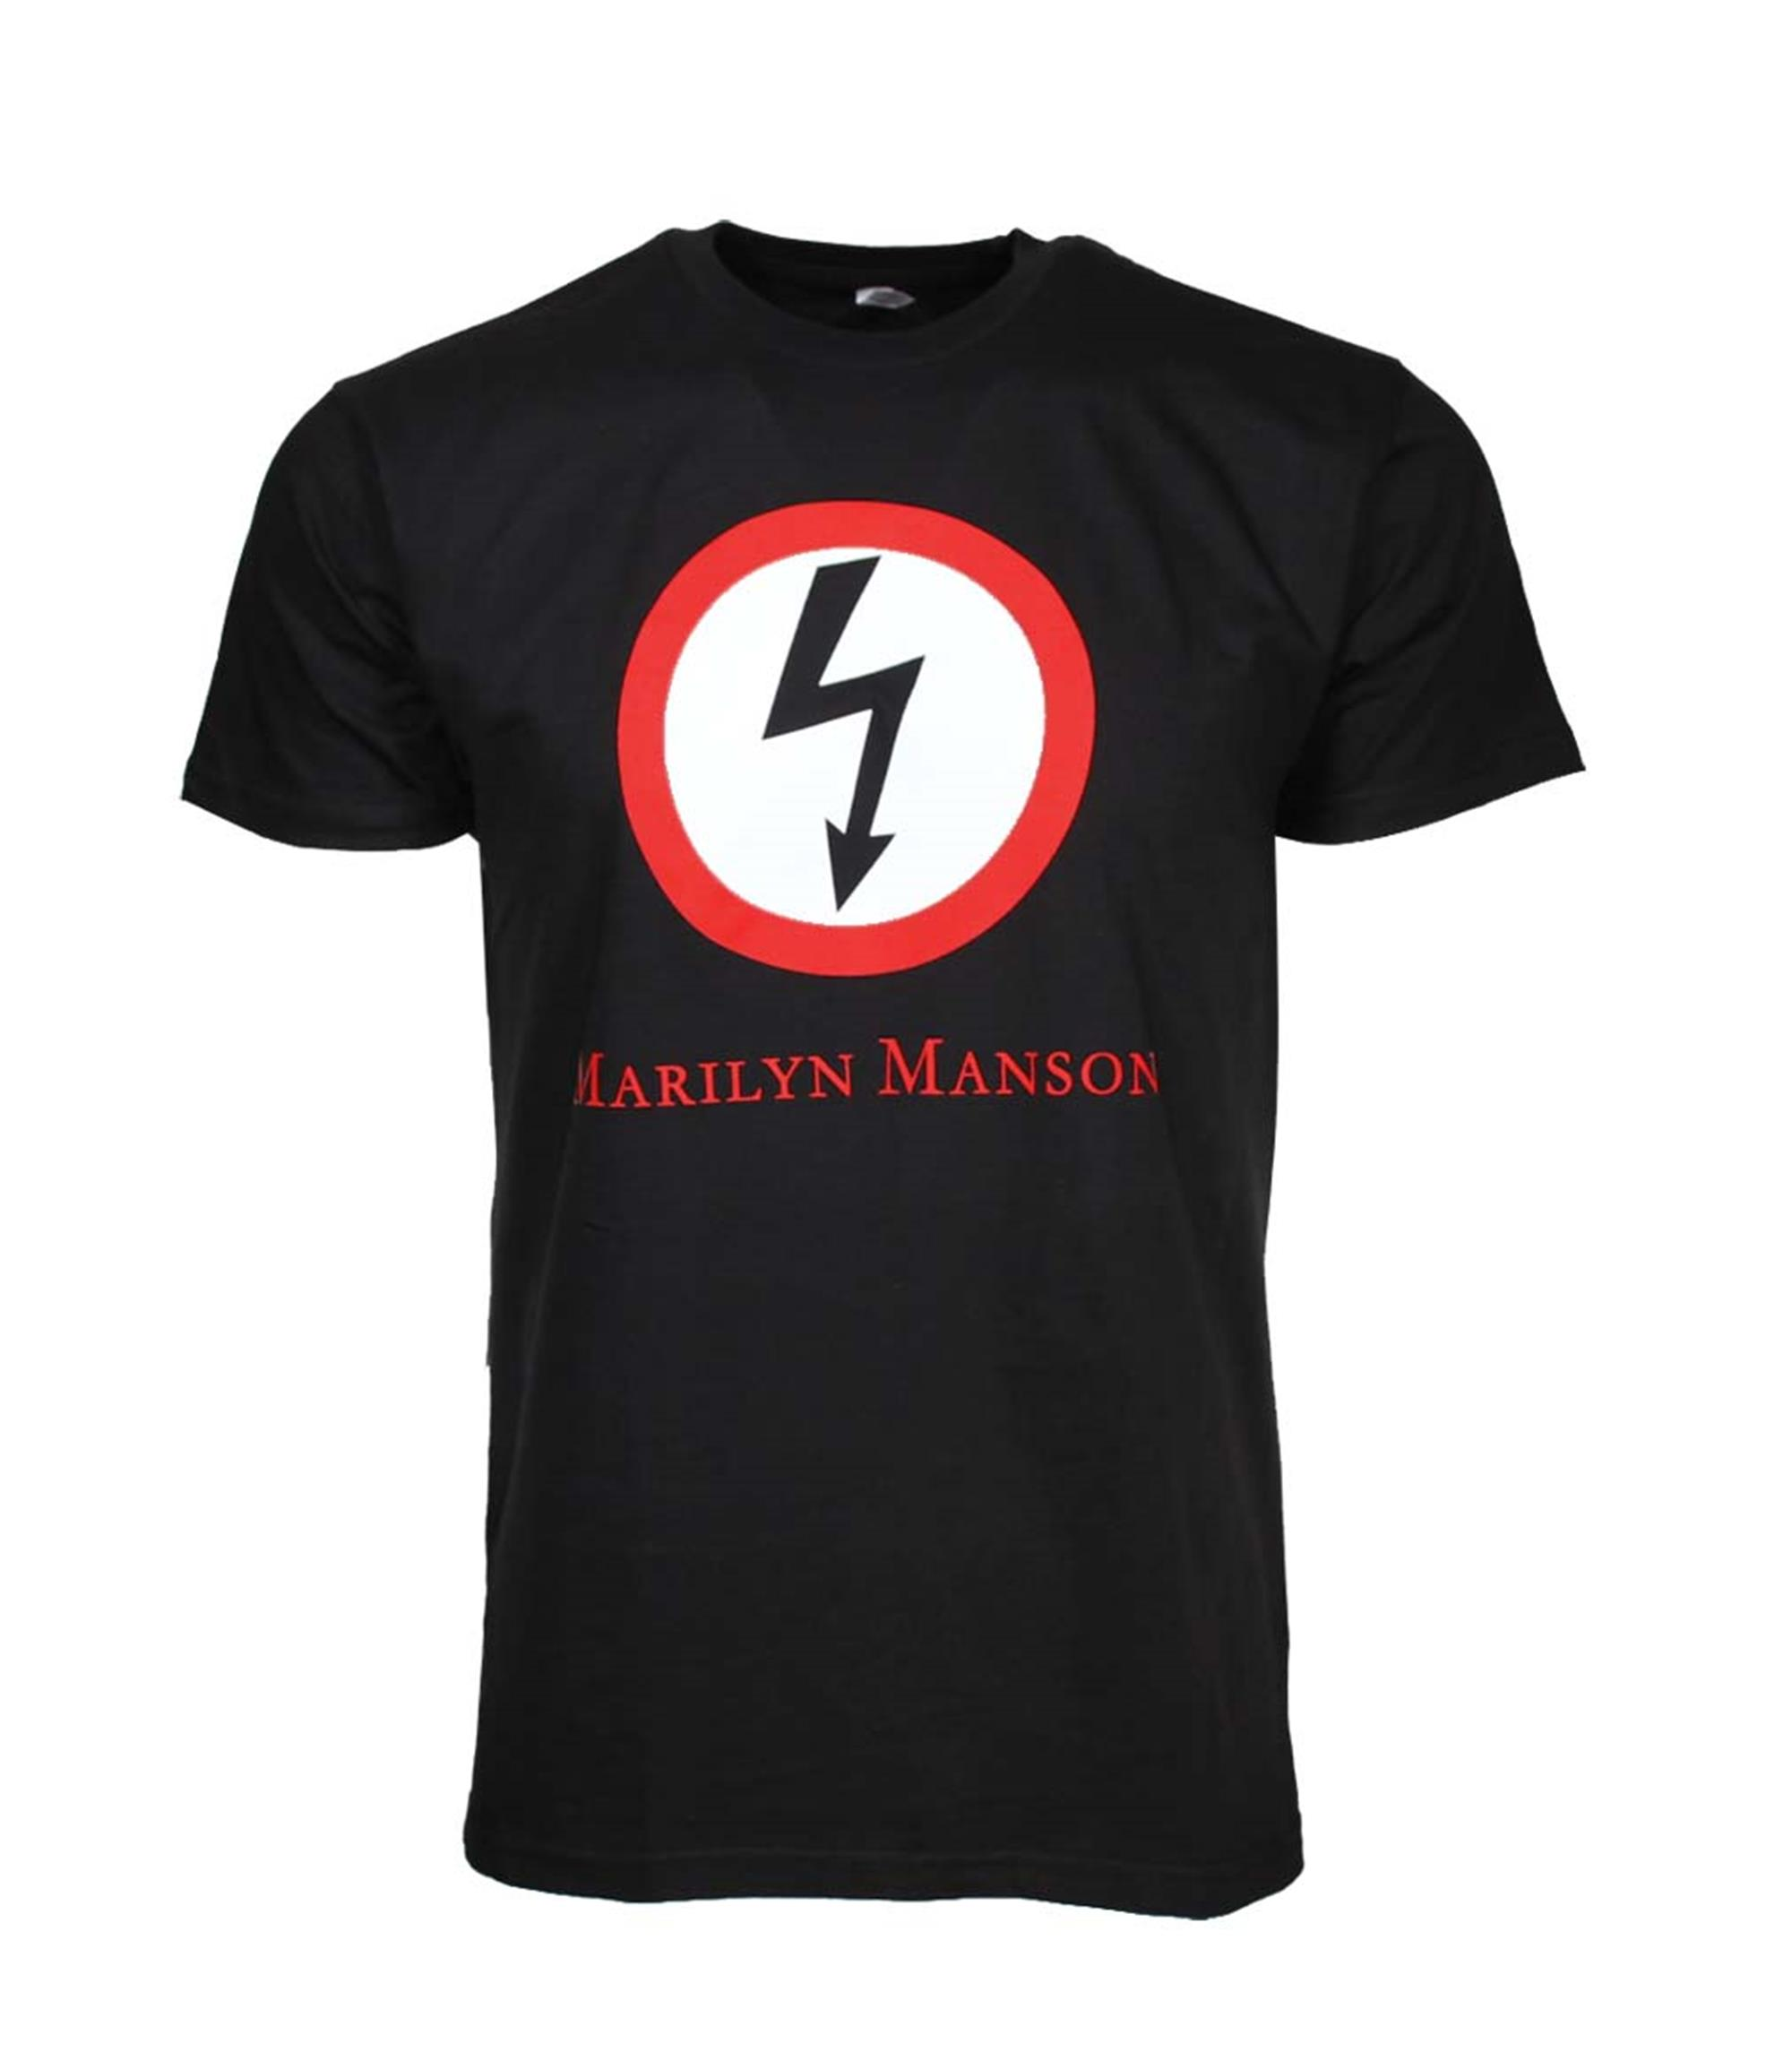 Marilyn Manson Classic Bolt T-Shirt